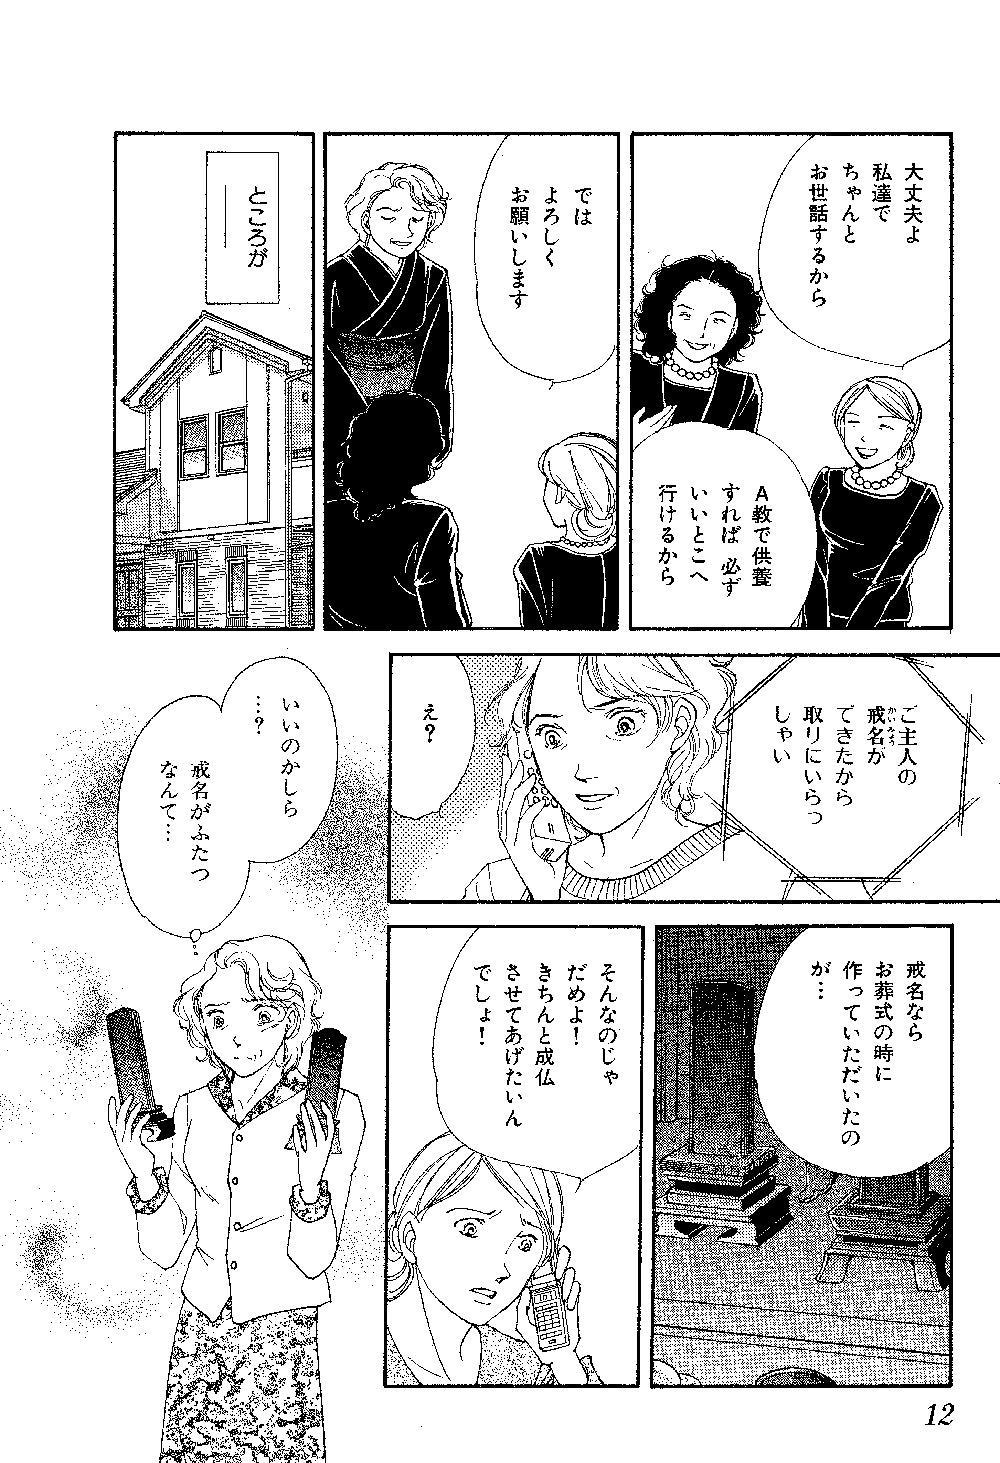 mayuri_0001_0012.jpg